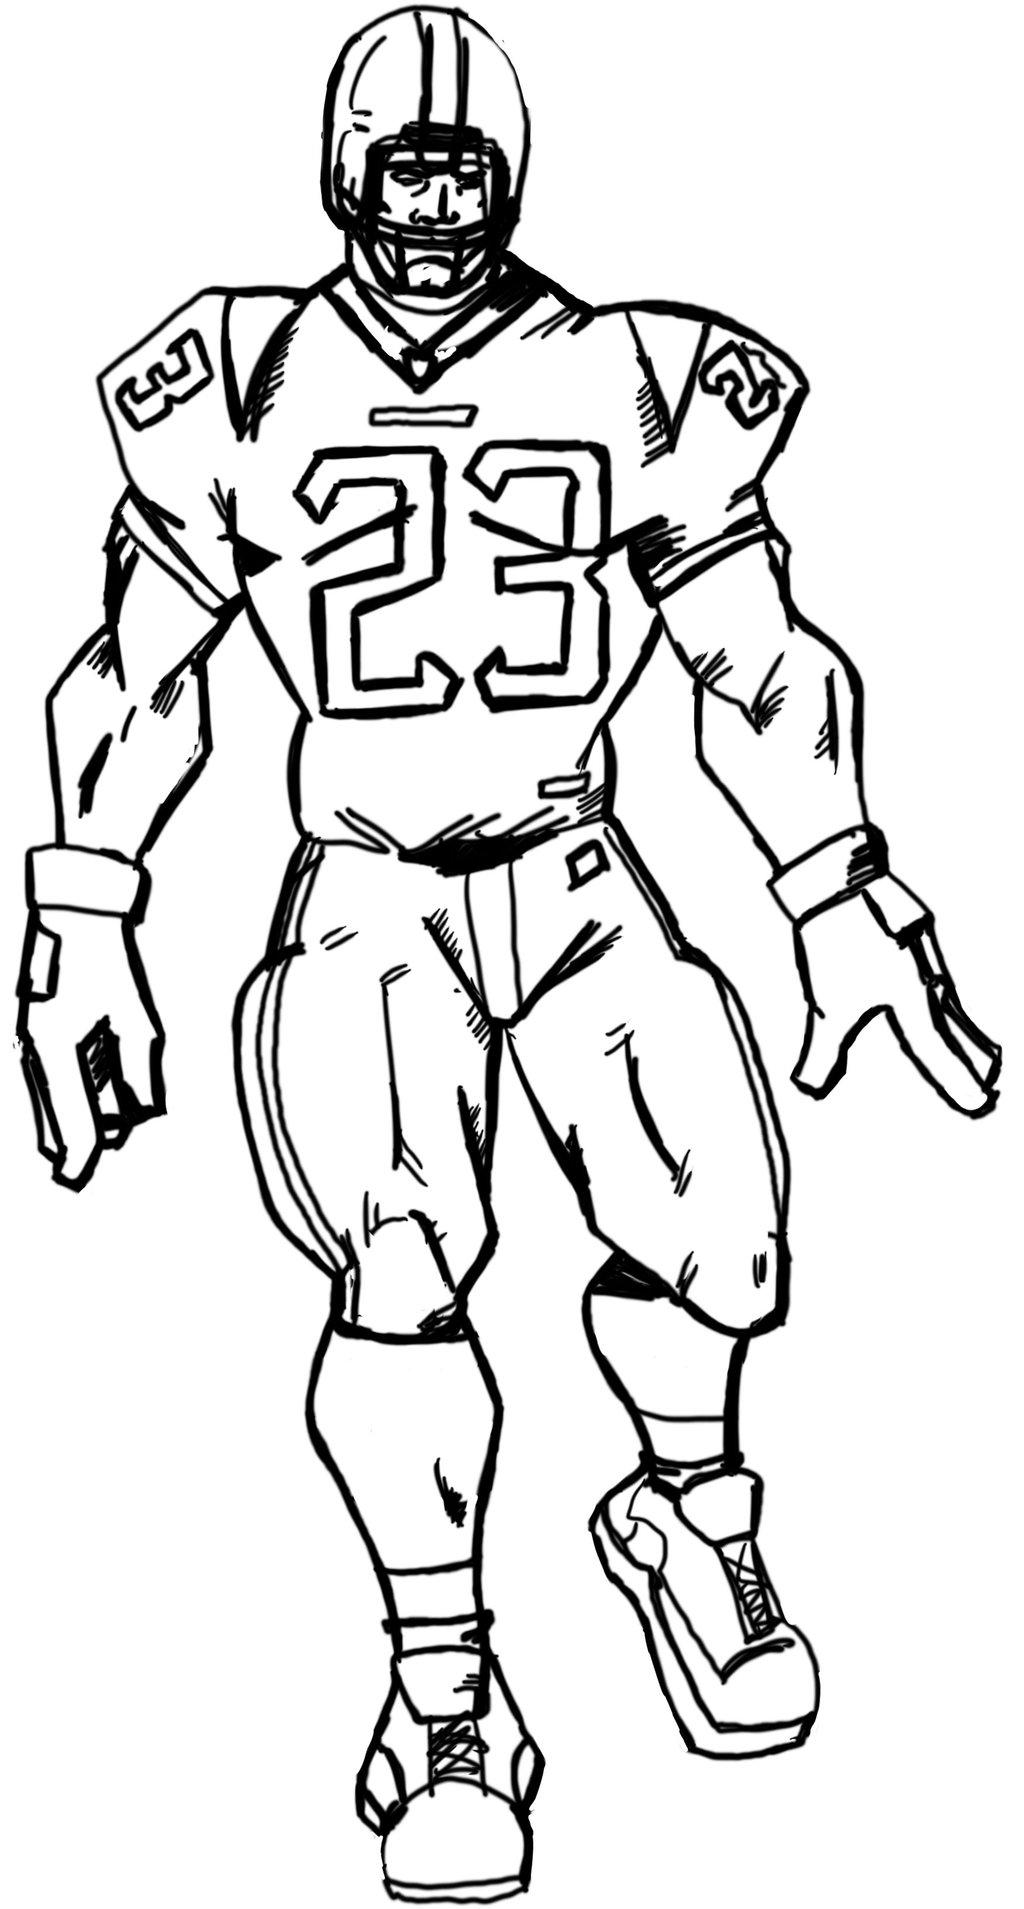 1024x1909 Drawing A Cartoon Football Player